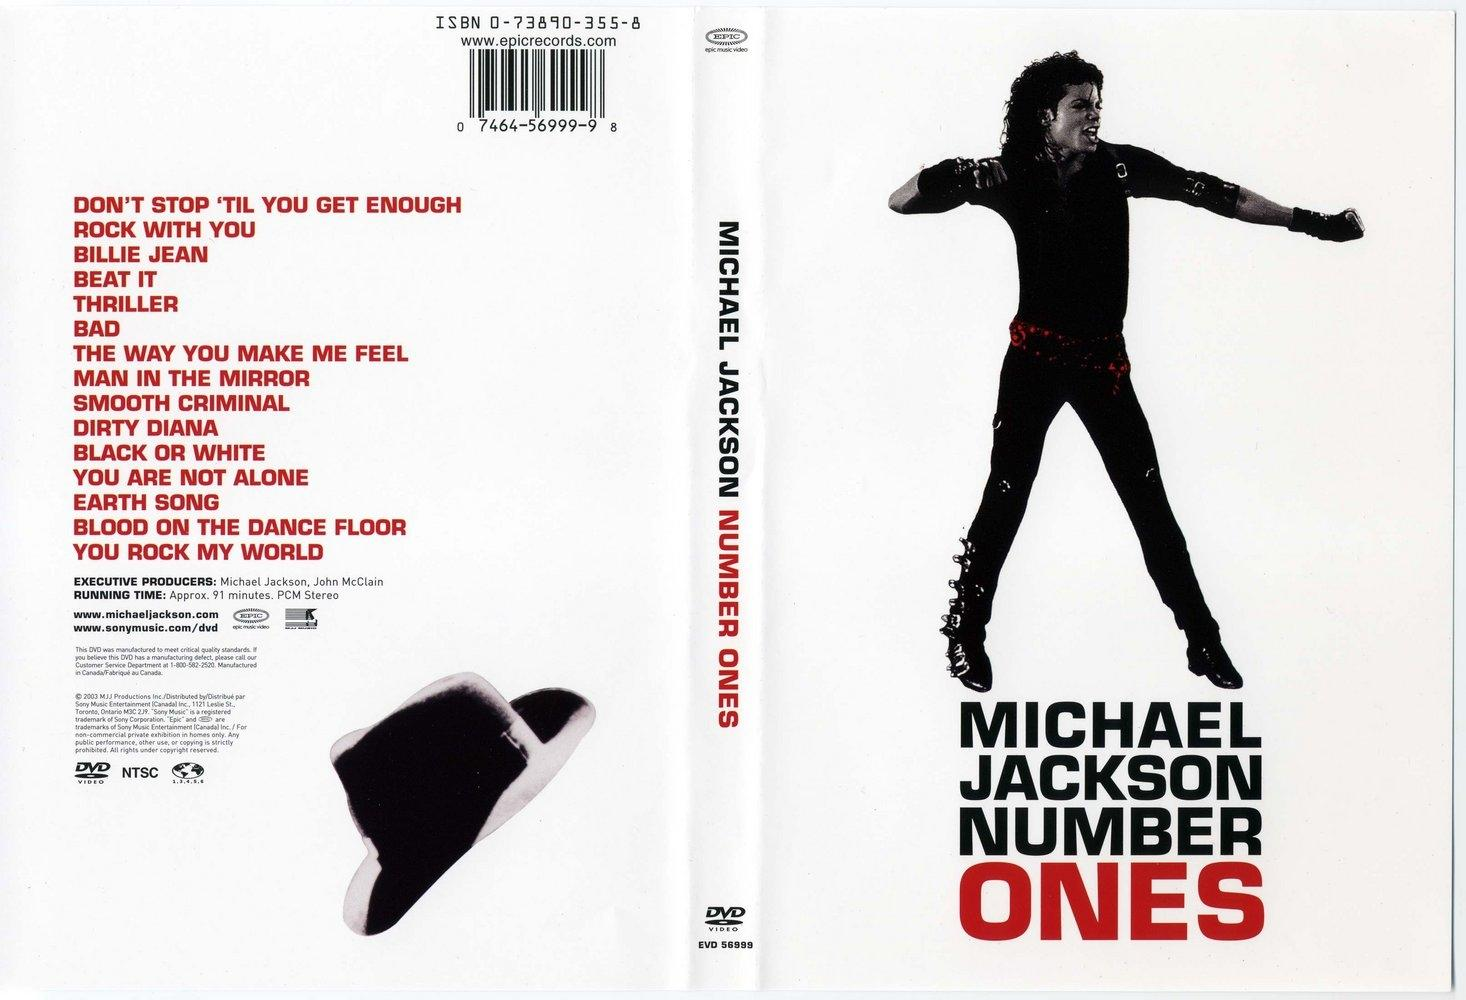 http://3.bp.blogspot.com/_np_ONNy_PGQ/TDRjuqZWgoI/AAAAAAAAAiw/79XTmrWNL8c/s1600/Michael+Jackson+Number+Ones+DVD.jpg